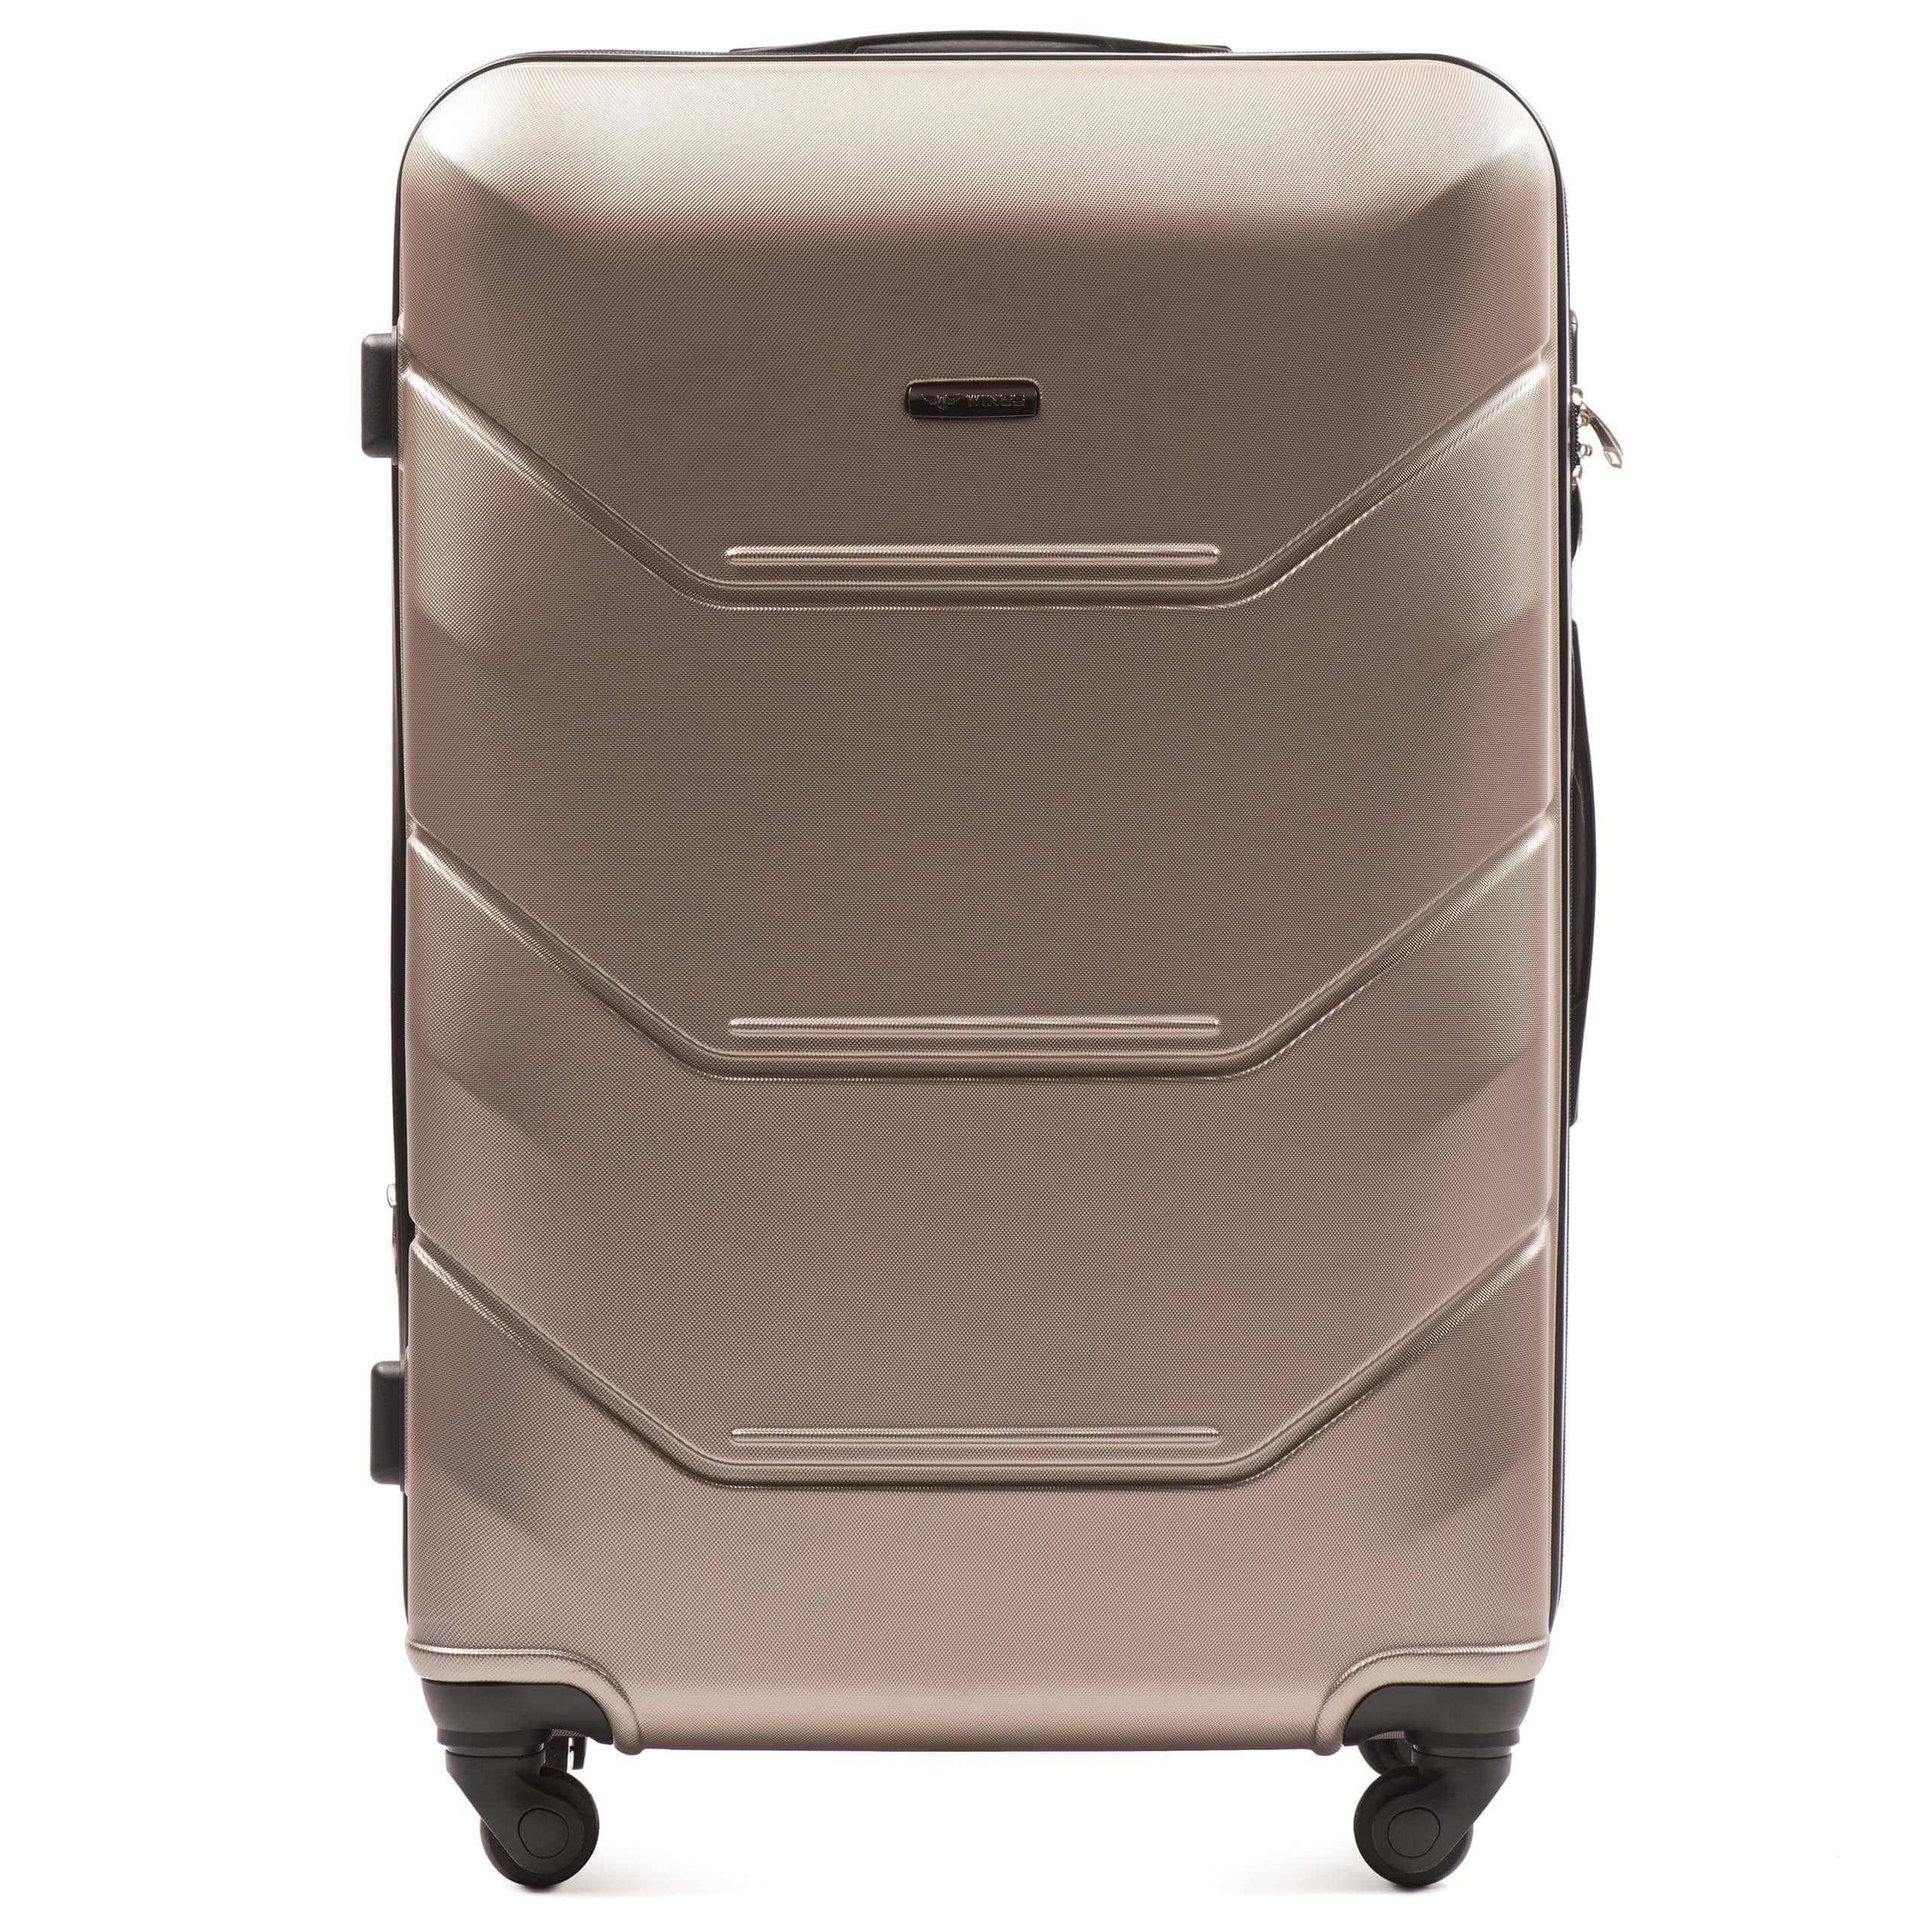 БОЛЬШОЙ ЧЕМОДАН WINGS 147 L Champany PREMIUM НА 4-Х КАУЧУКОВЫХ КОЛЕСАХ! Для багажа ,до 23 кг